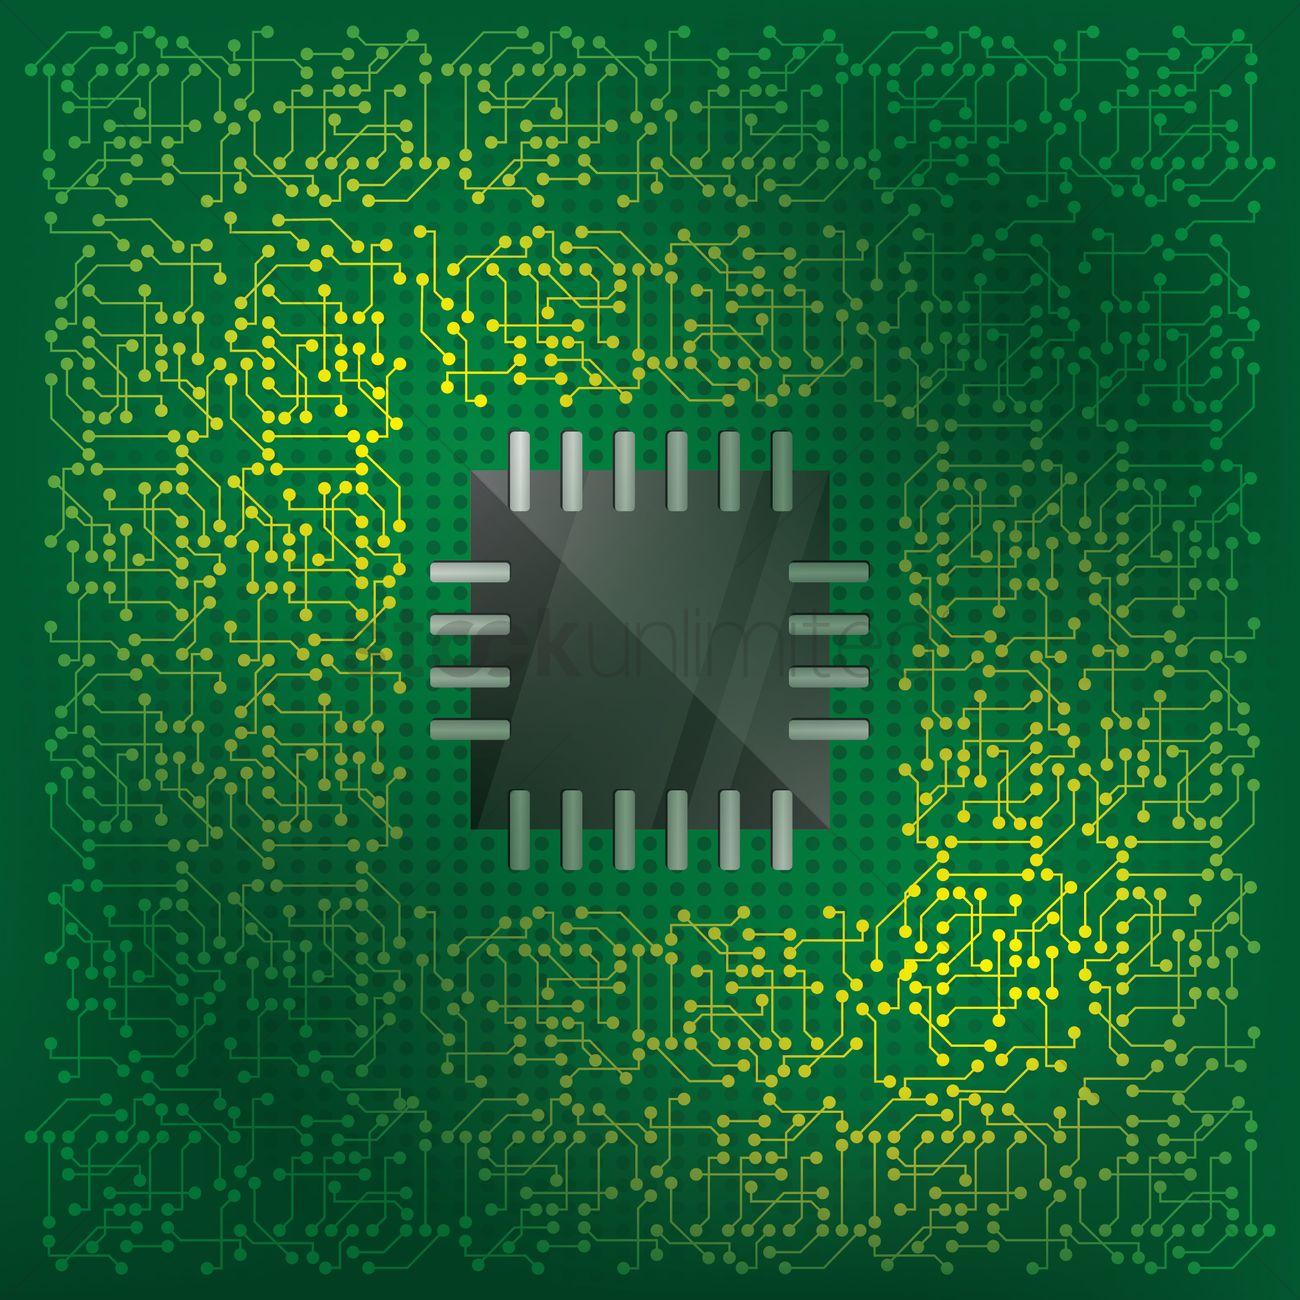 Stupendous Electronic Circuit Background Vector Image 1502673 Stockunlimited Wiring Cloud Filiciilluminateatxorg